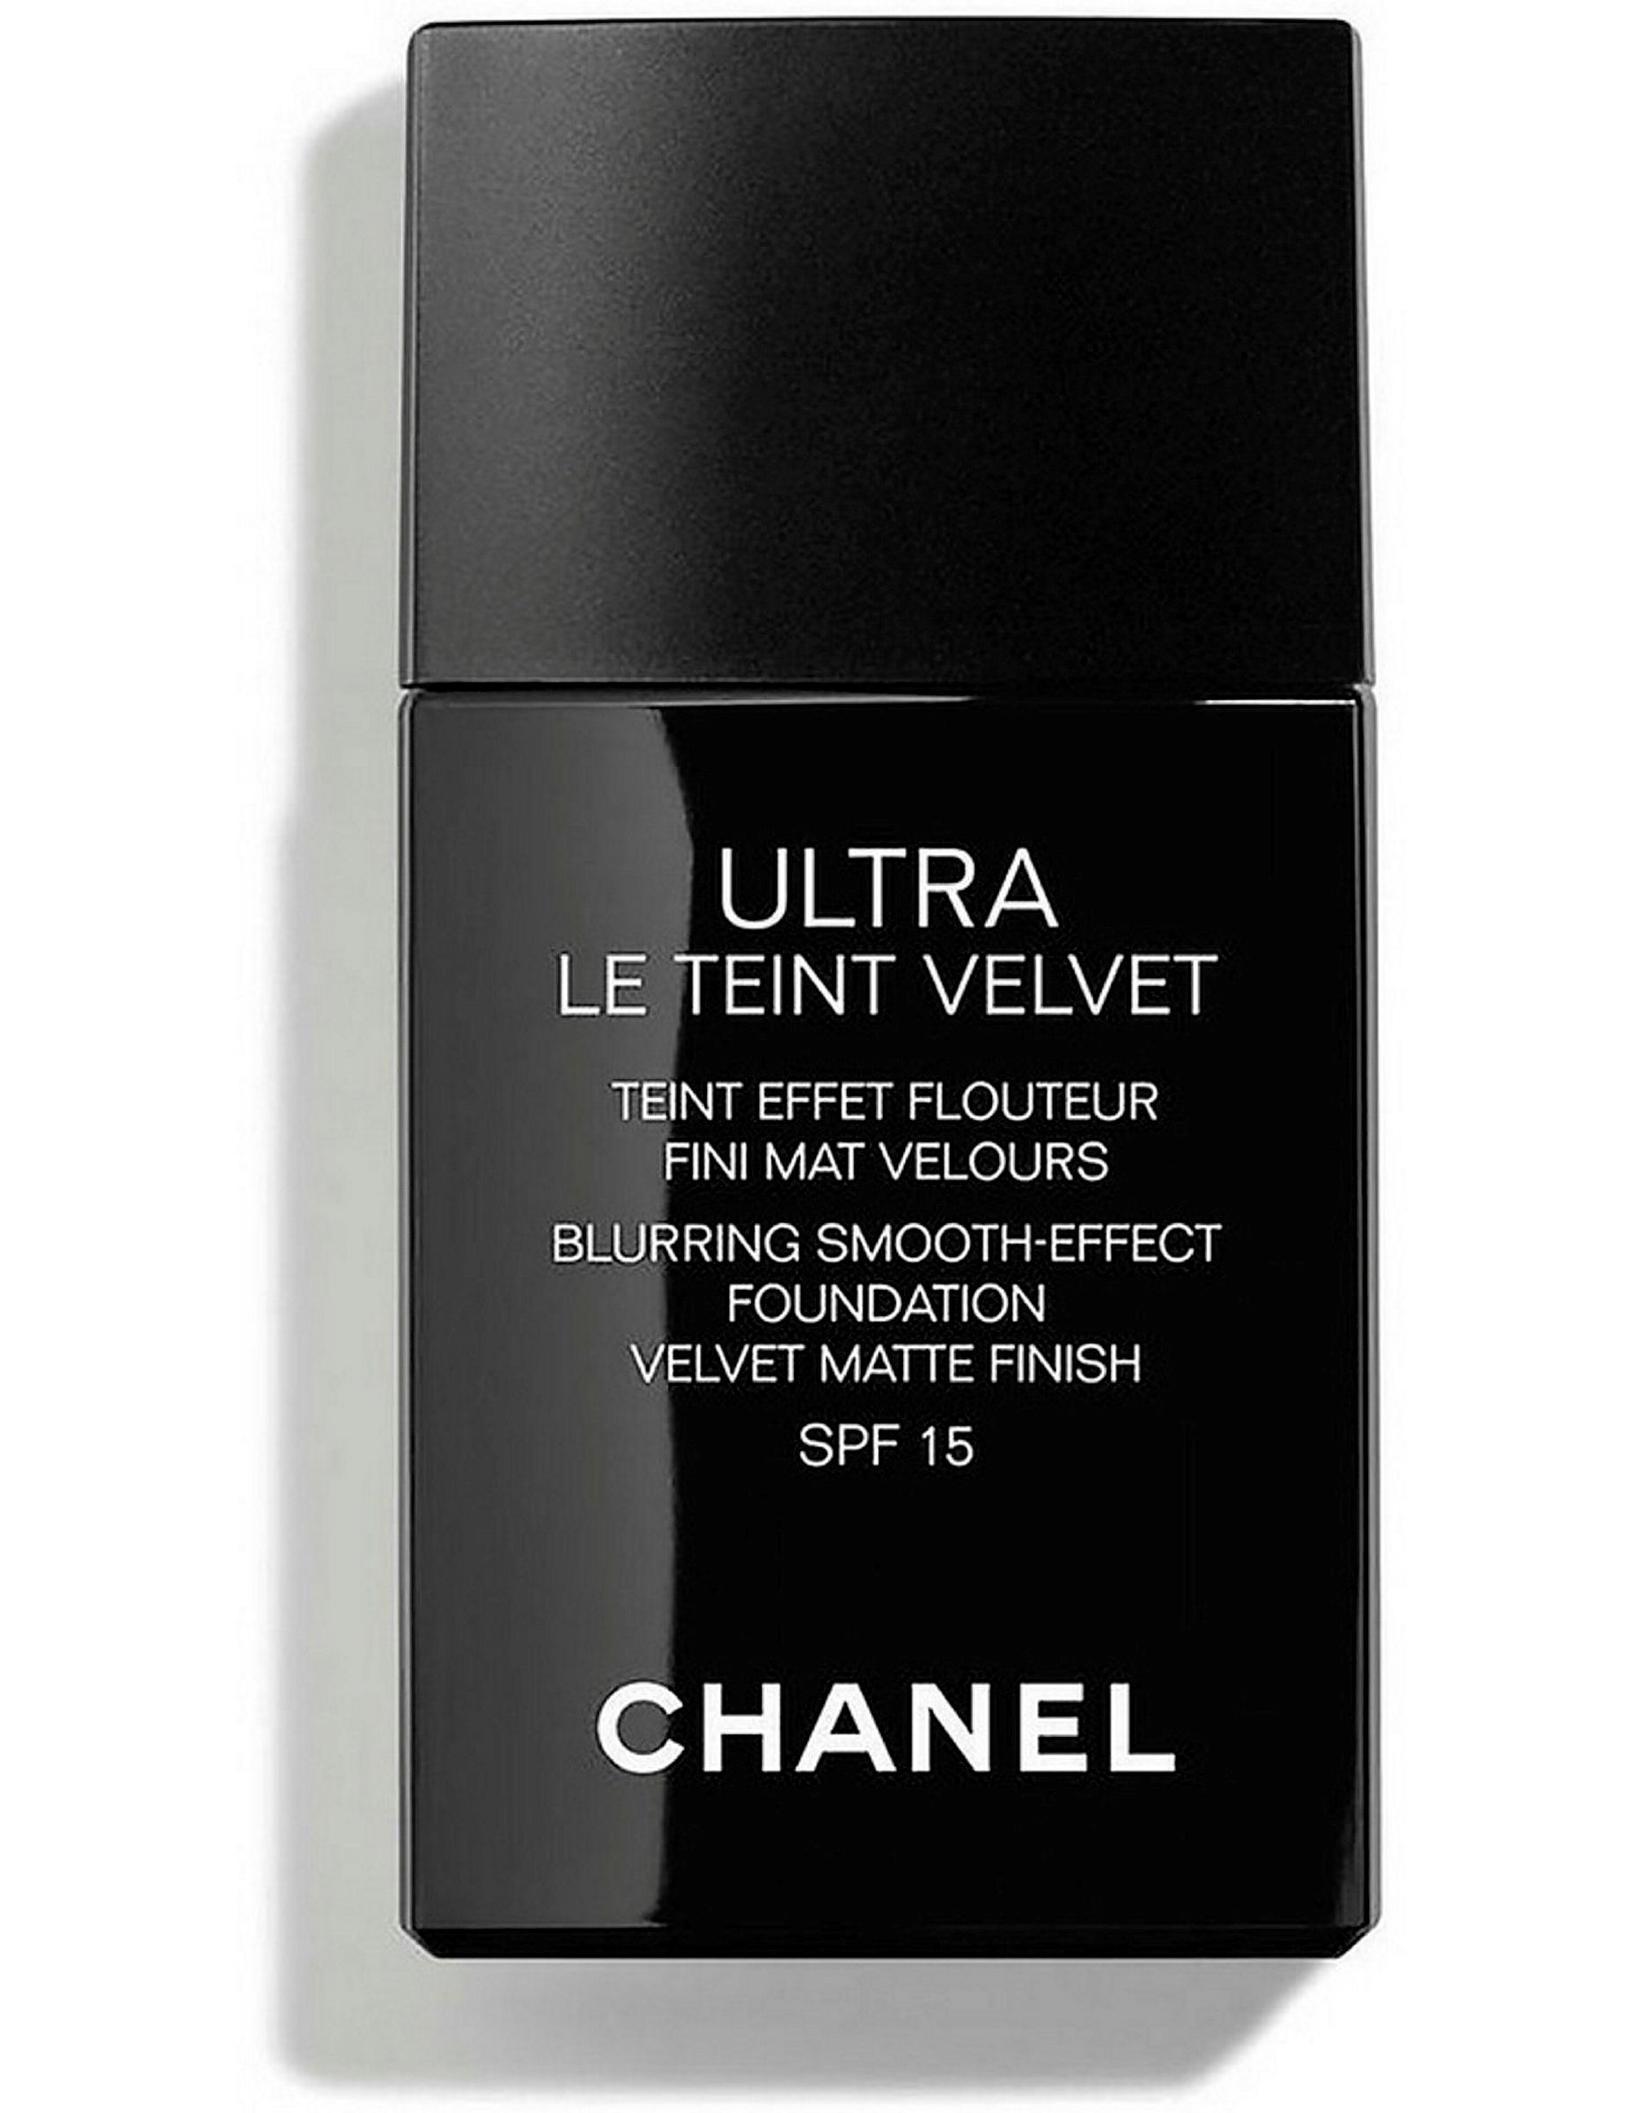 Ultra Le Teint Velvet frá Chanel.